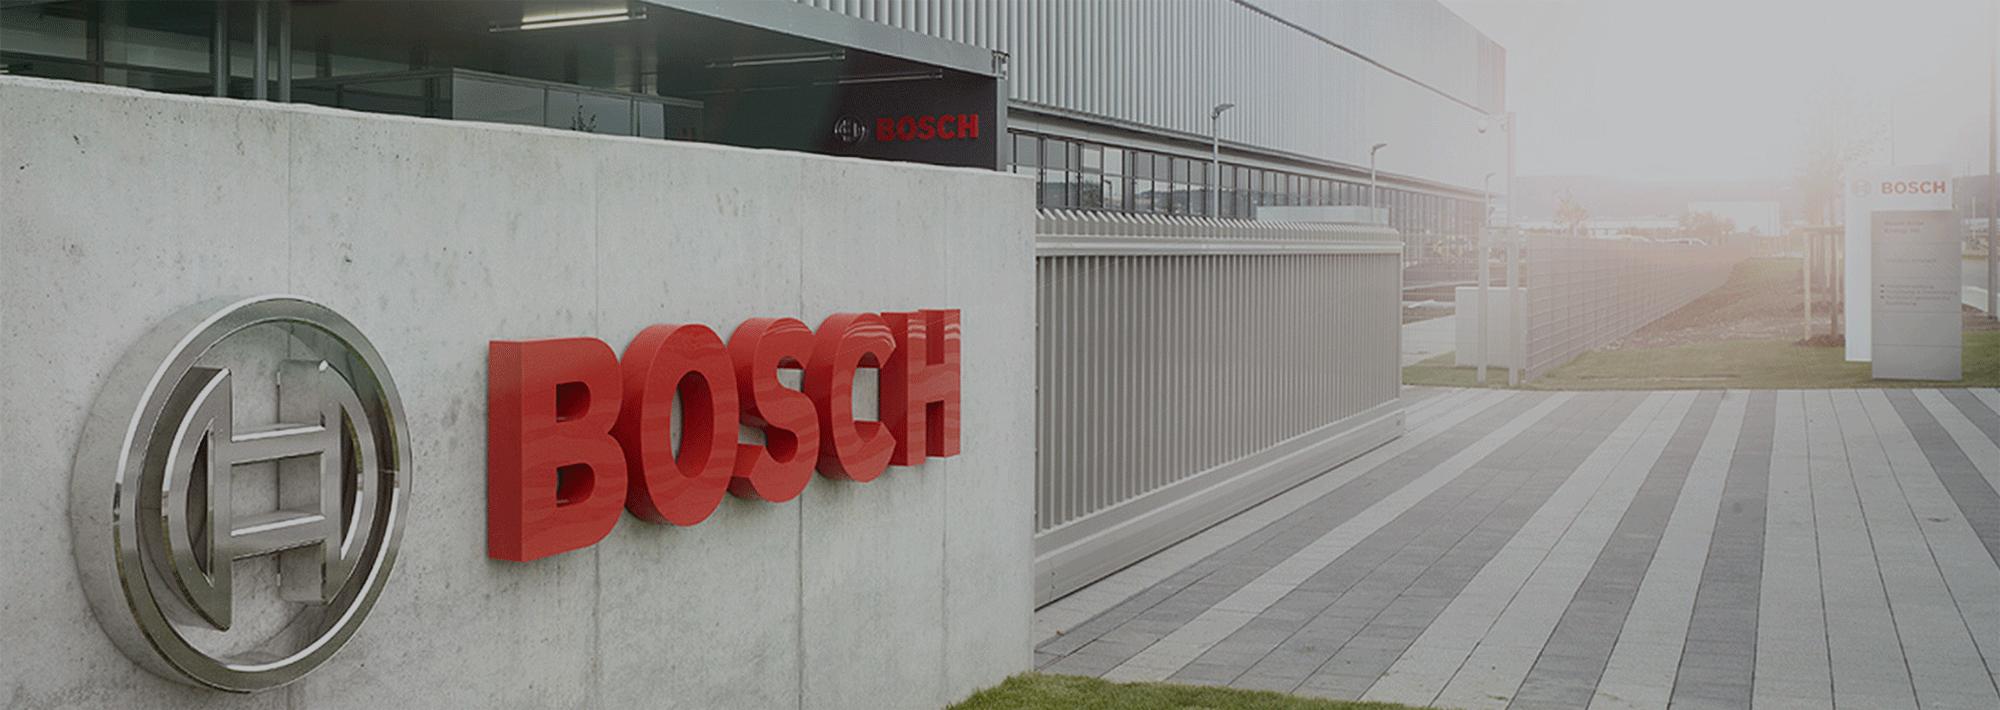 About Bosch